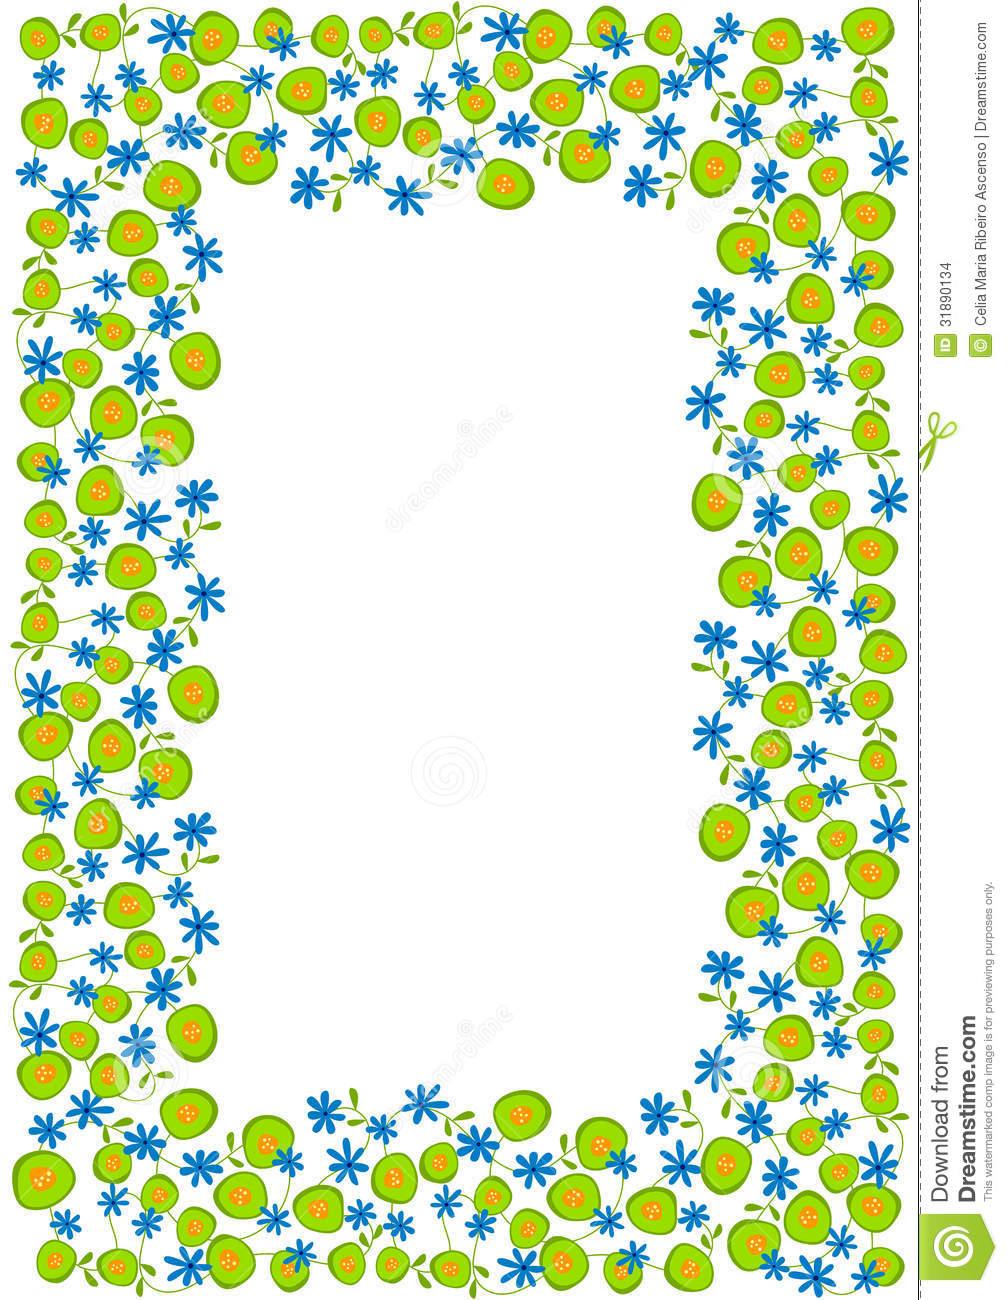 Green Floral Border Png Picture - Ivy Frame - Free ... |Green Flower Border